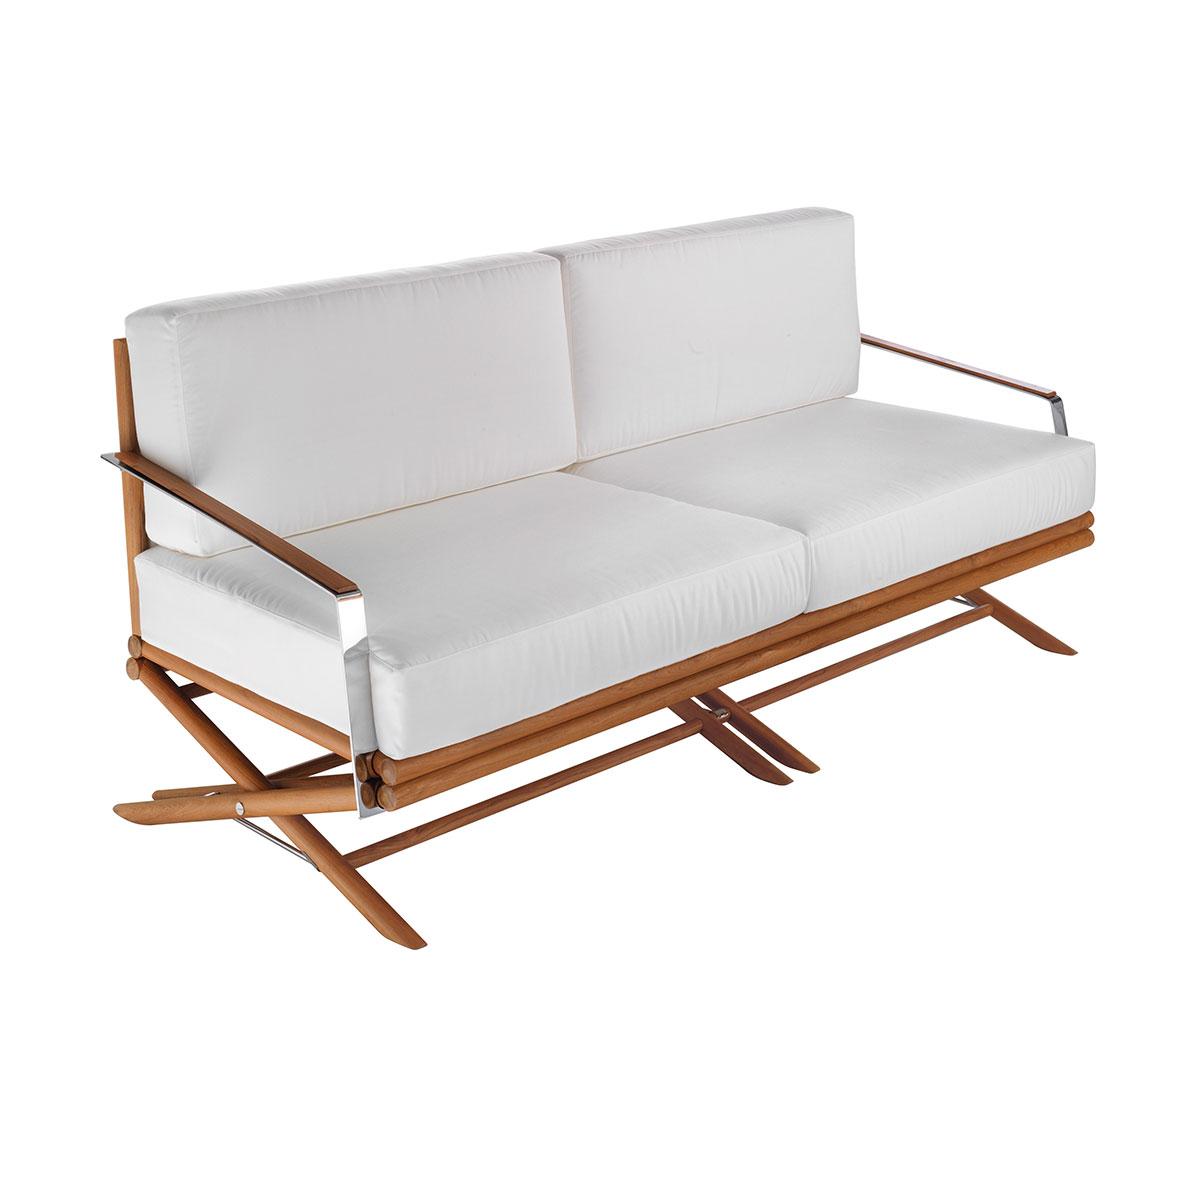 3 seated sofa Maxim Braid